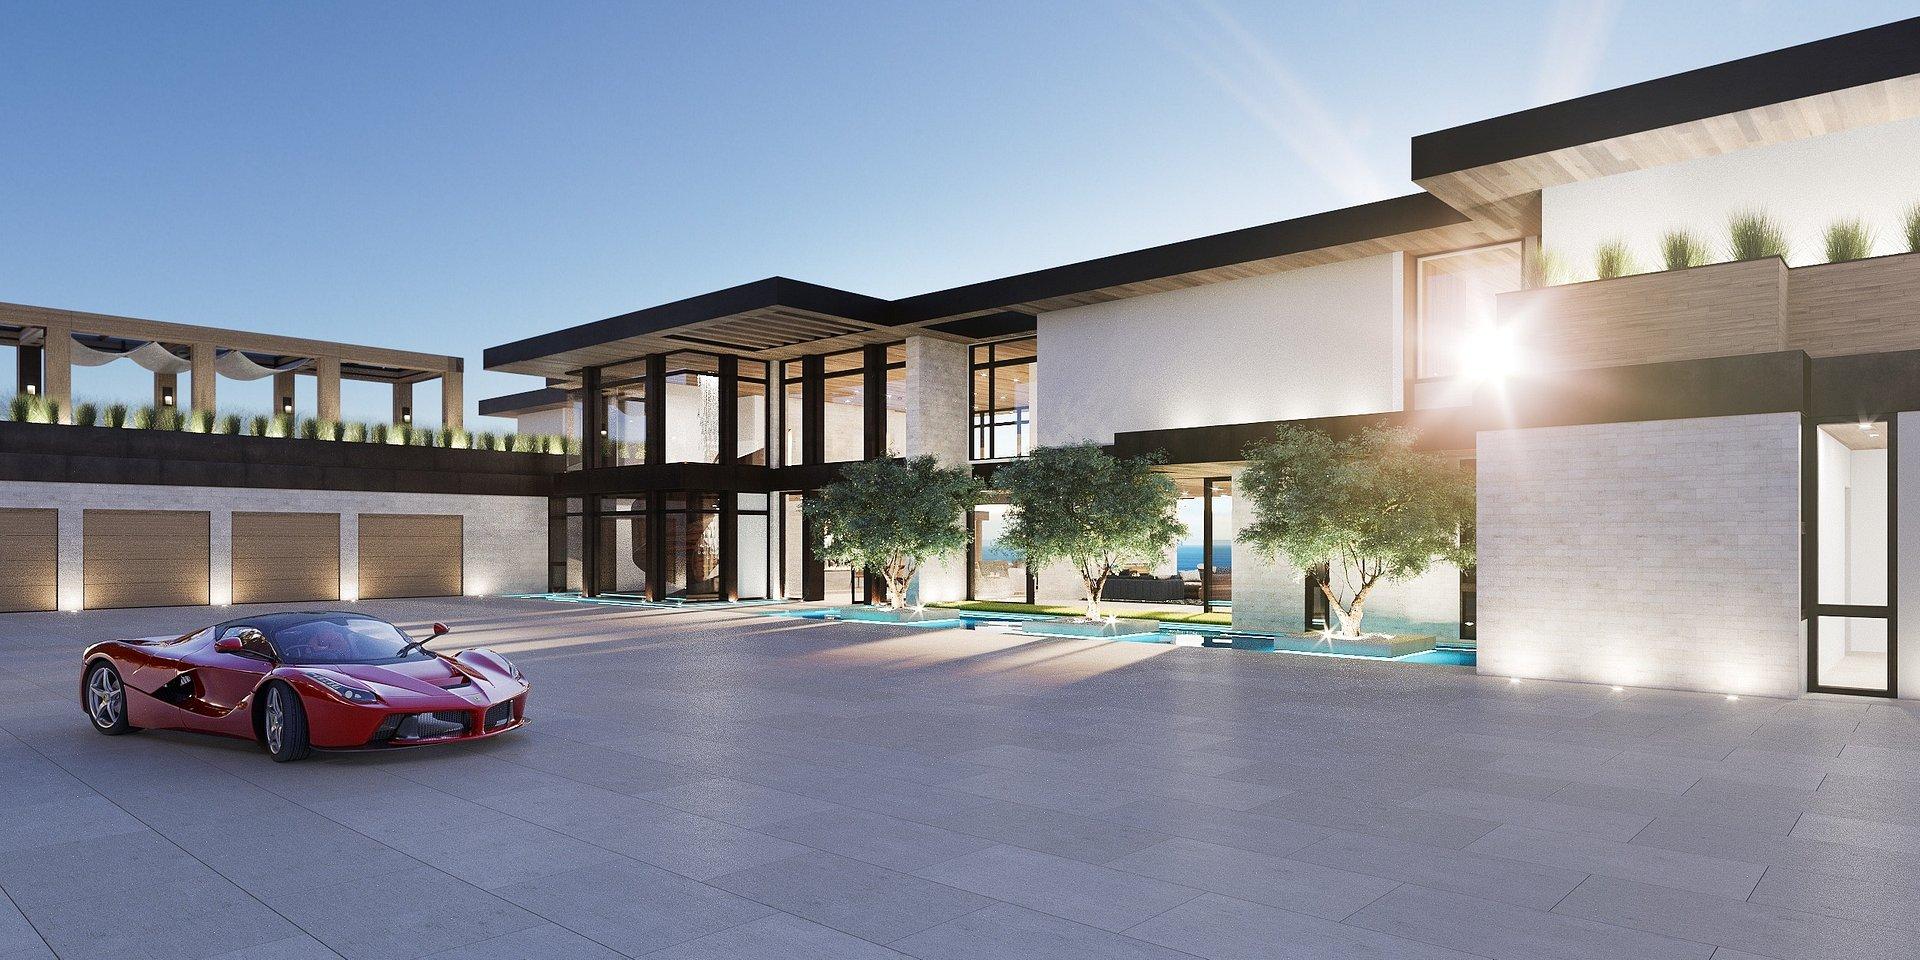 Coldwell Banker Residential Brokerage Lists Malibu Property in Celebrity Neighborhood for $36 Million